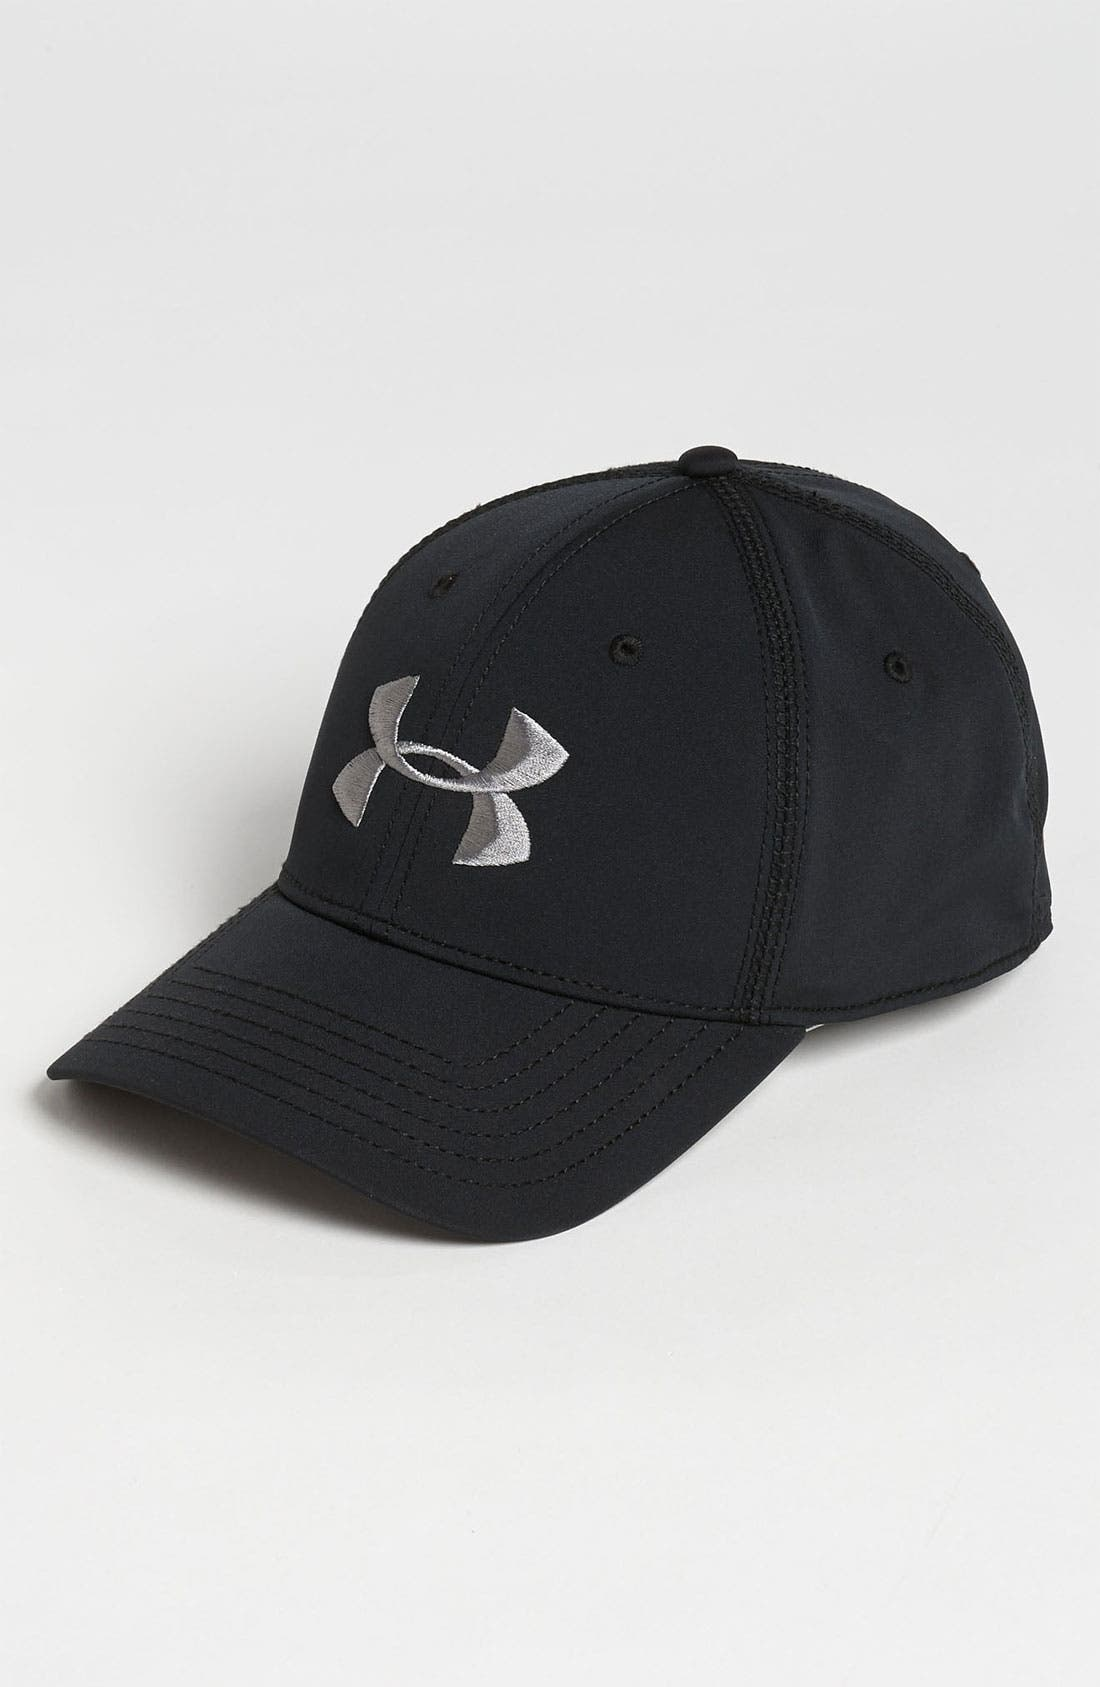 Main Image - Under Armour 'Huddle' Baseball Cap